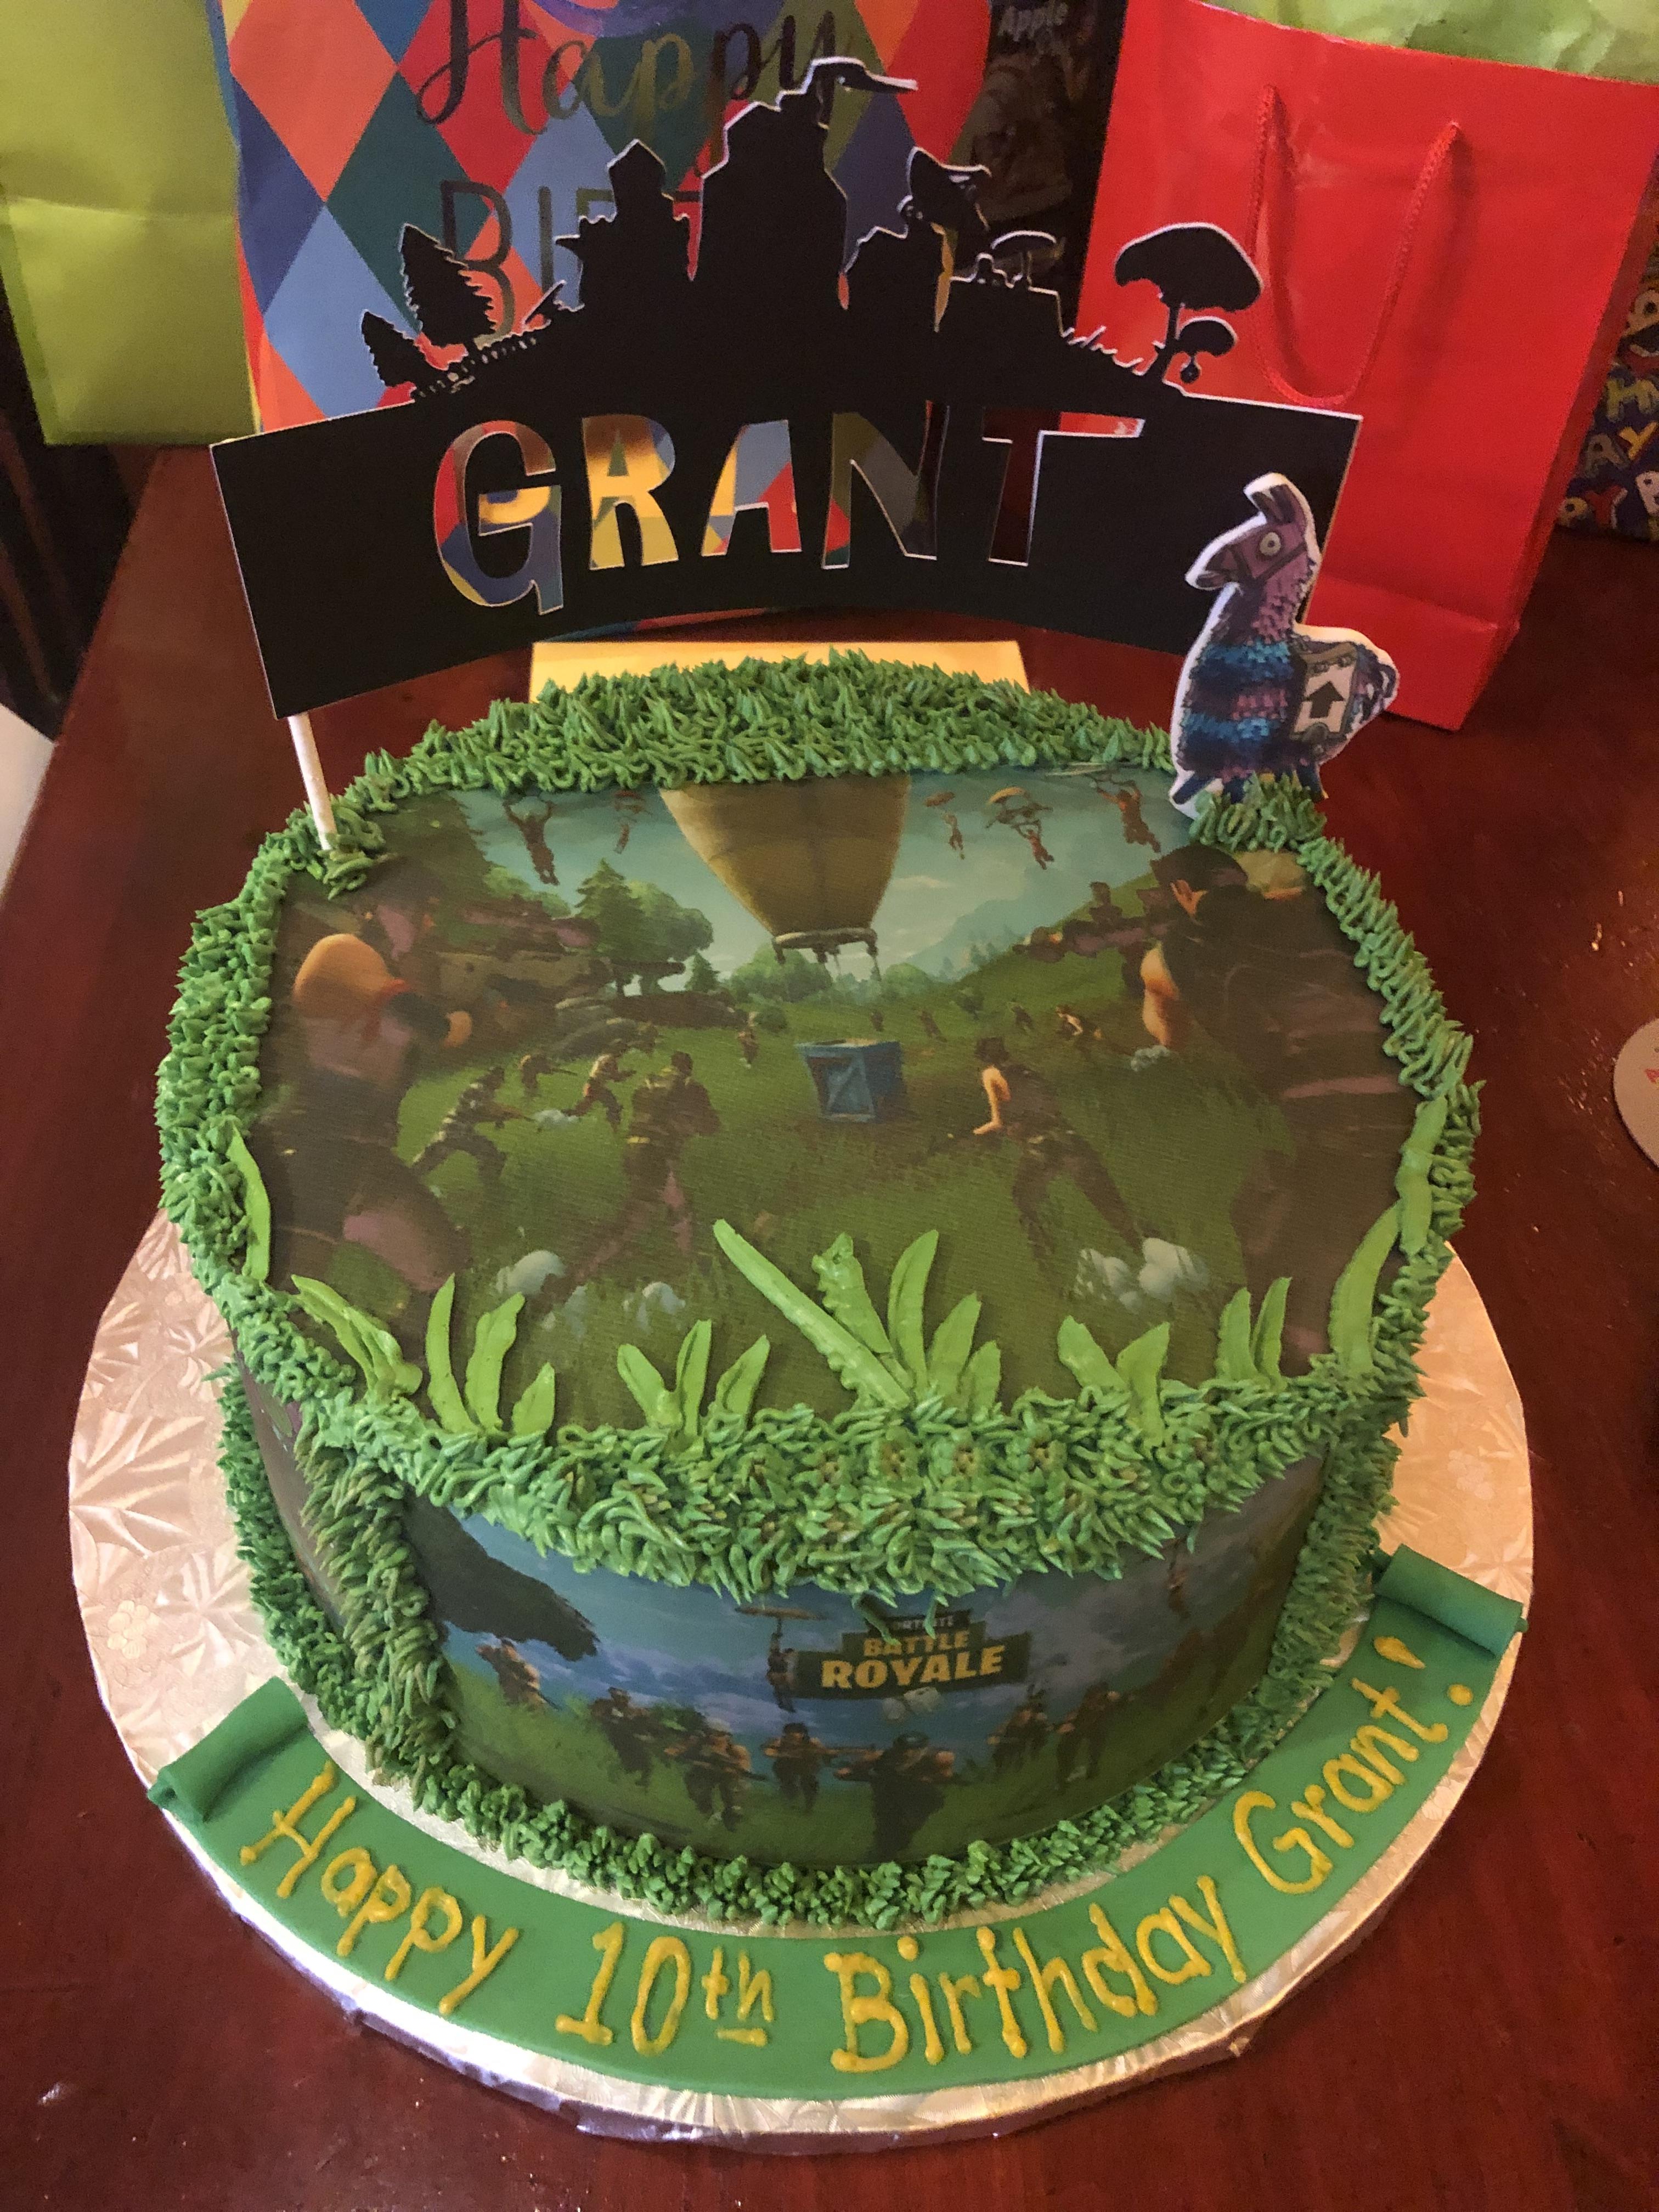 3146, 10th birthday, tenth birthday, fortnite, battle royale, edible image, topper, green, grass